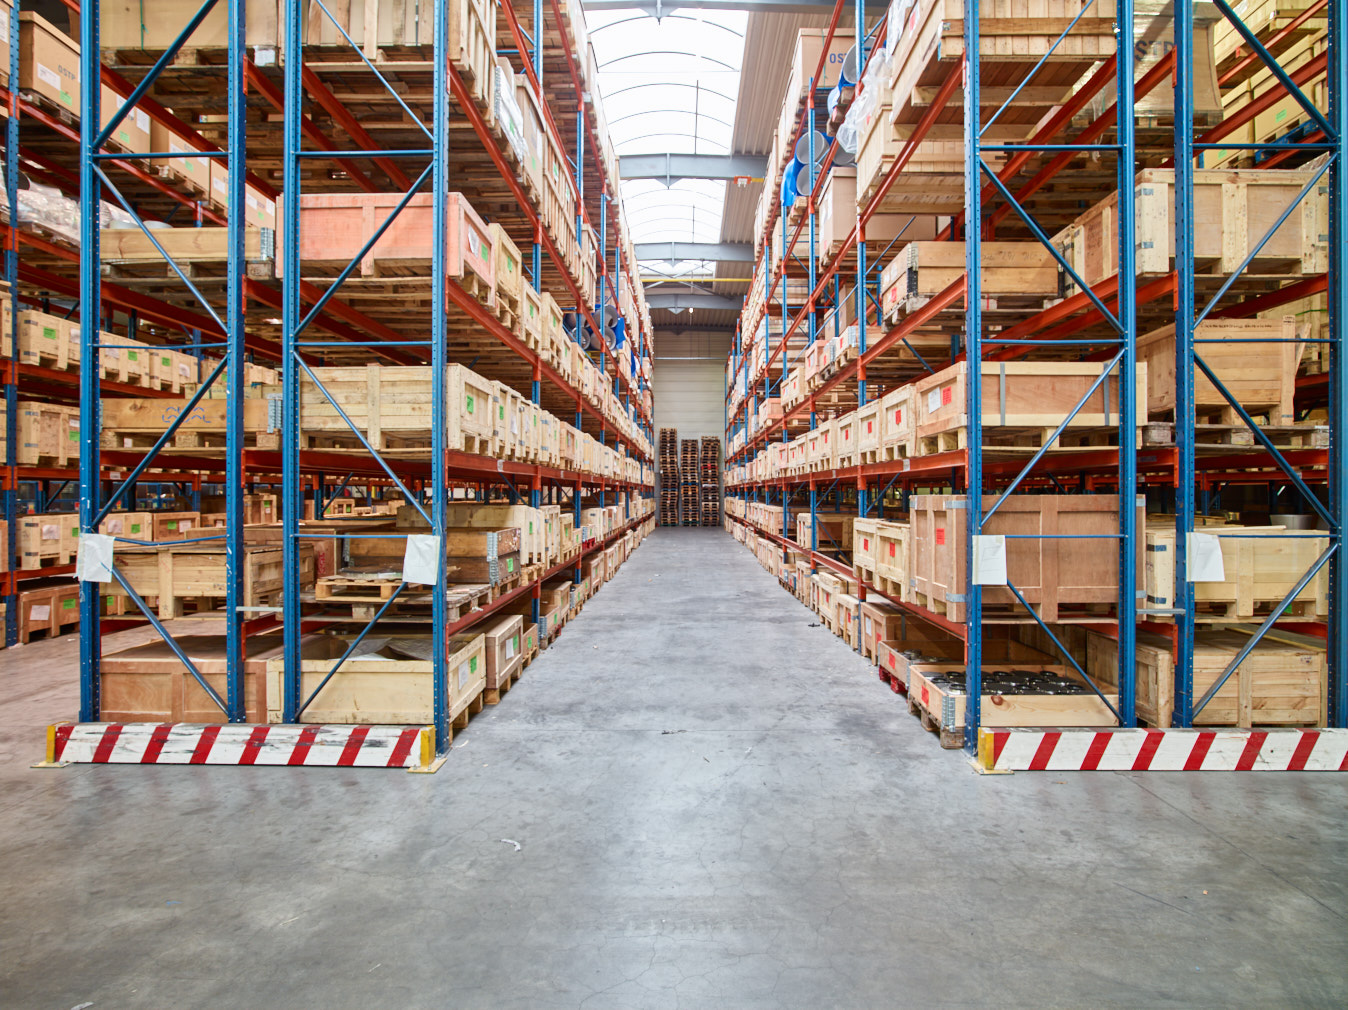 Atinox innove: premiers pas vers un entrepôt automatisé & WMS